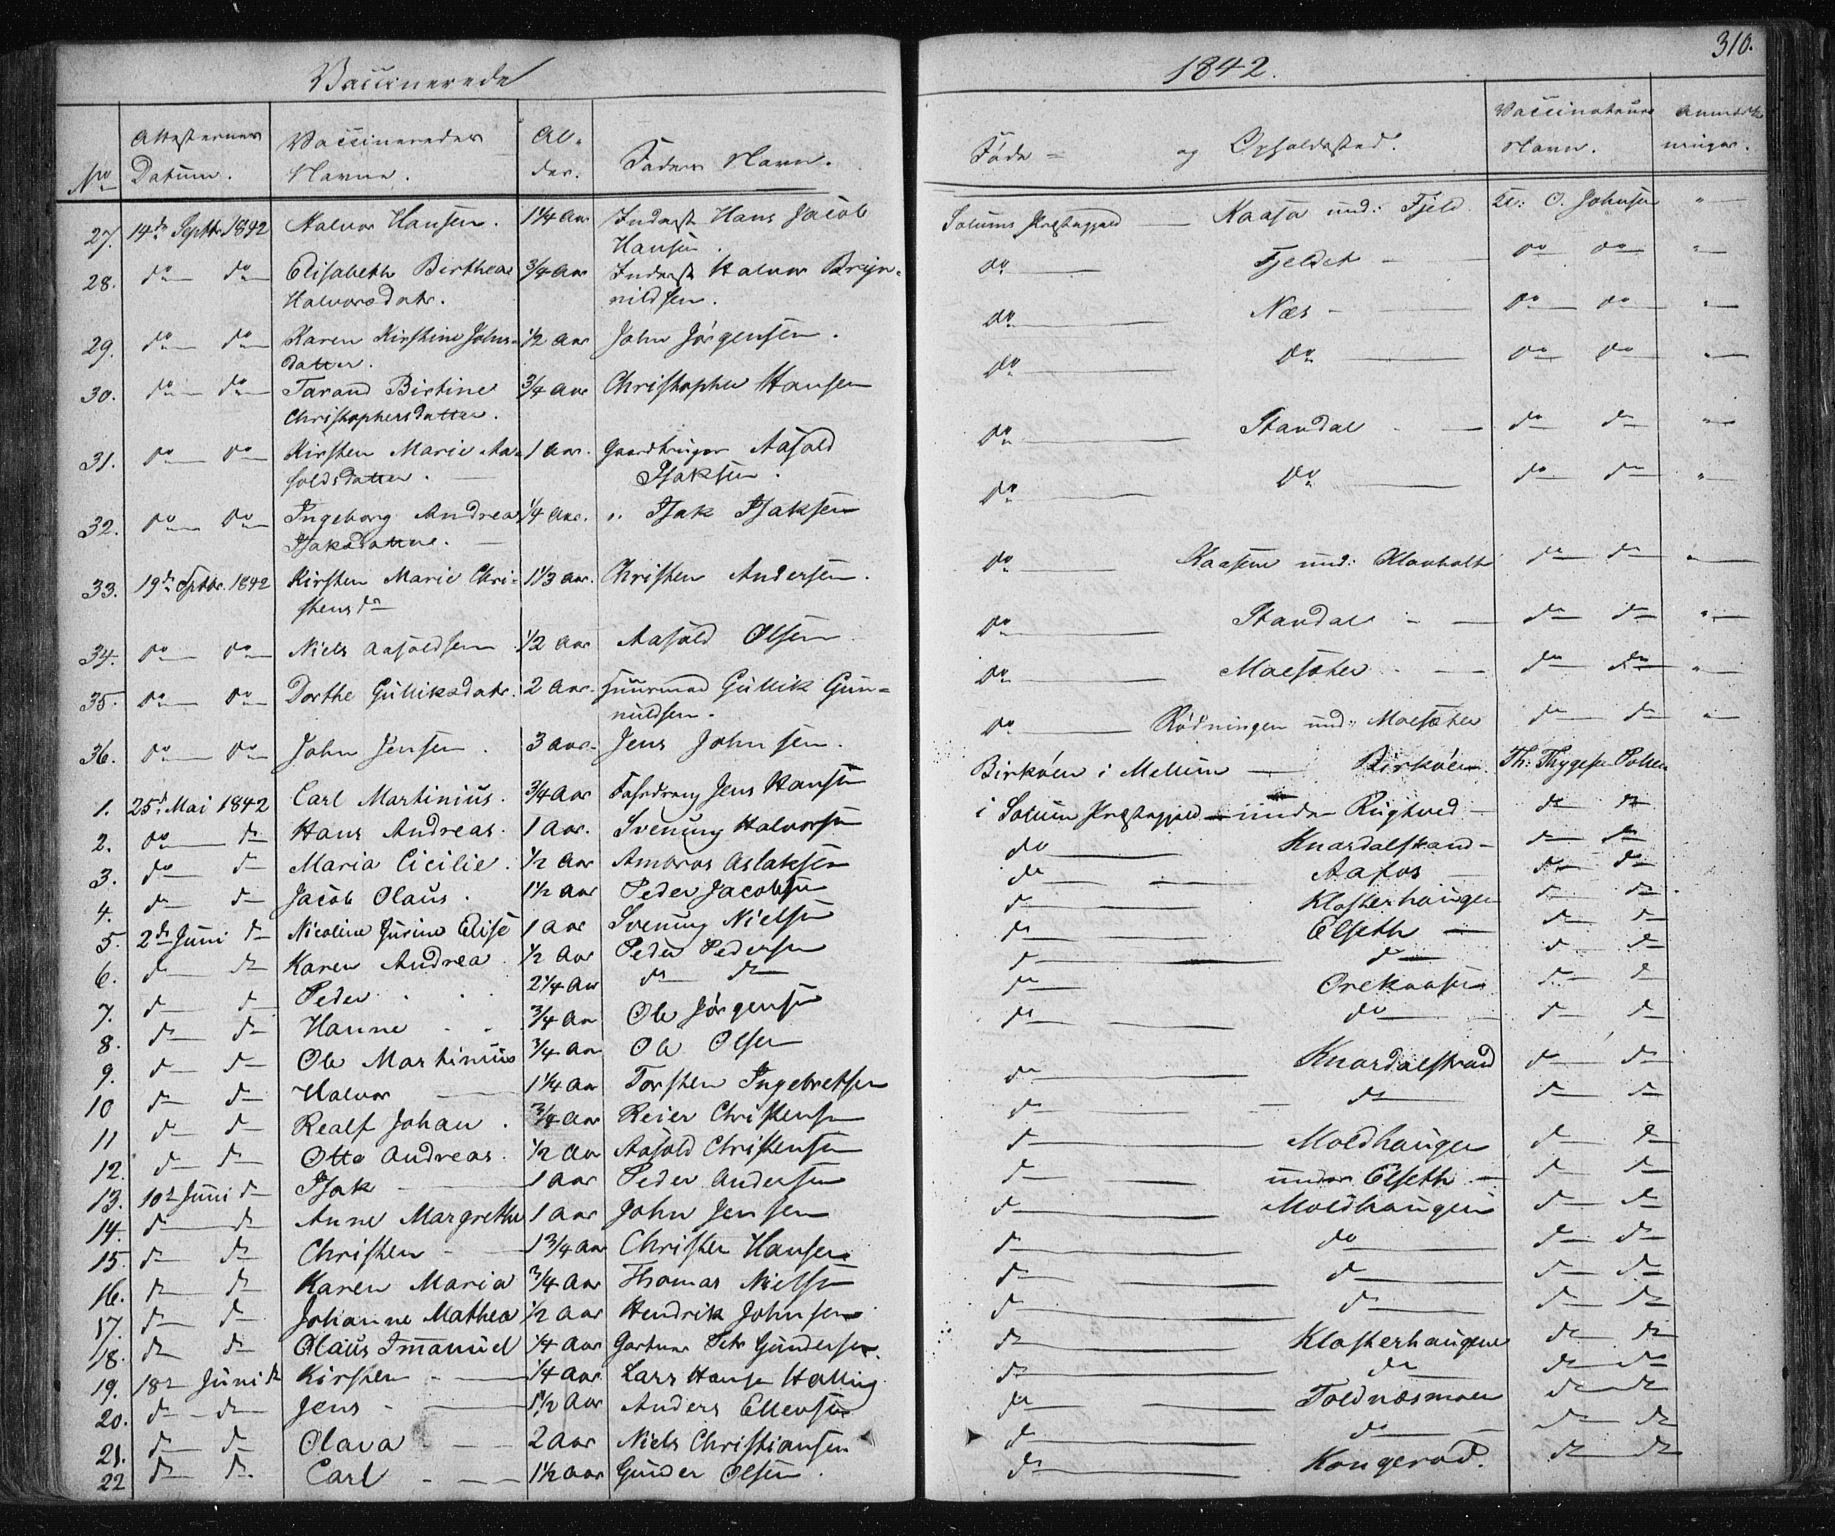 SAKO, Solum kirkebøker, F/Fa/L0005: Ministerialbok nr. I 5, 1833-1843, s. 310